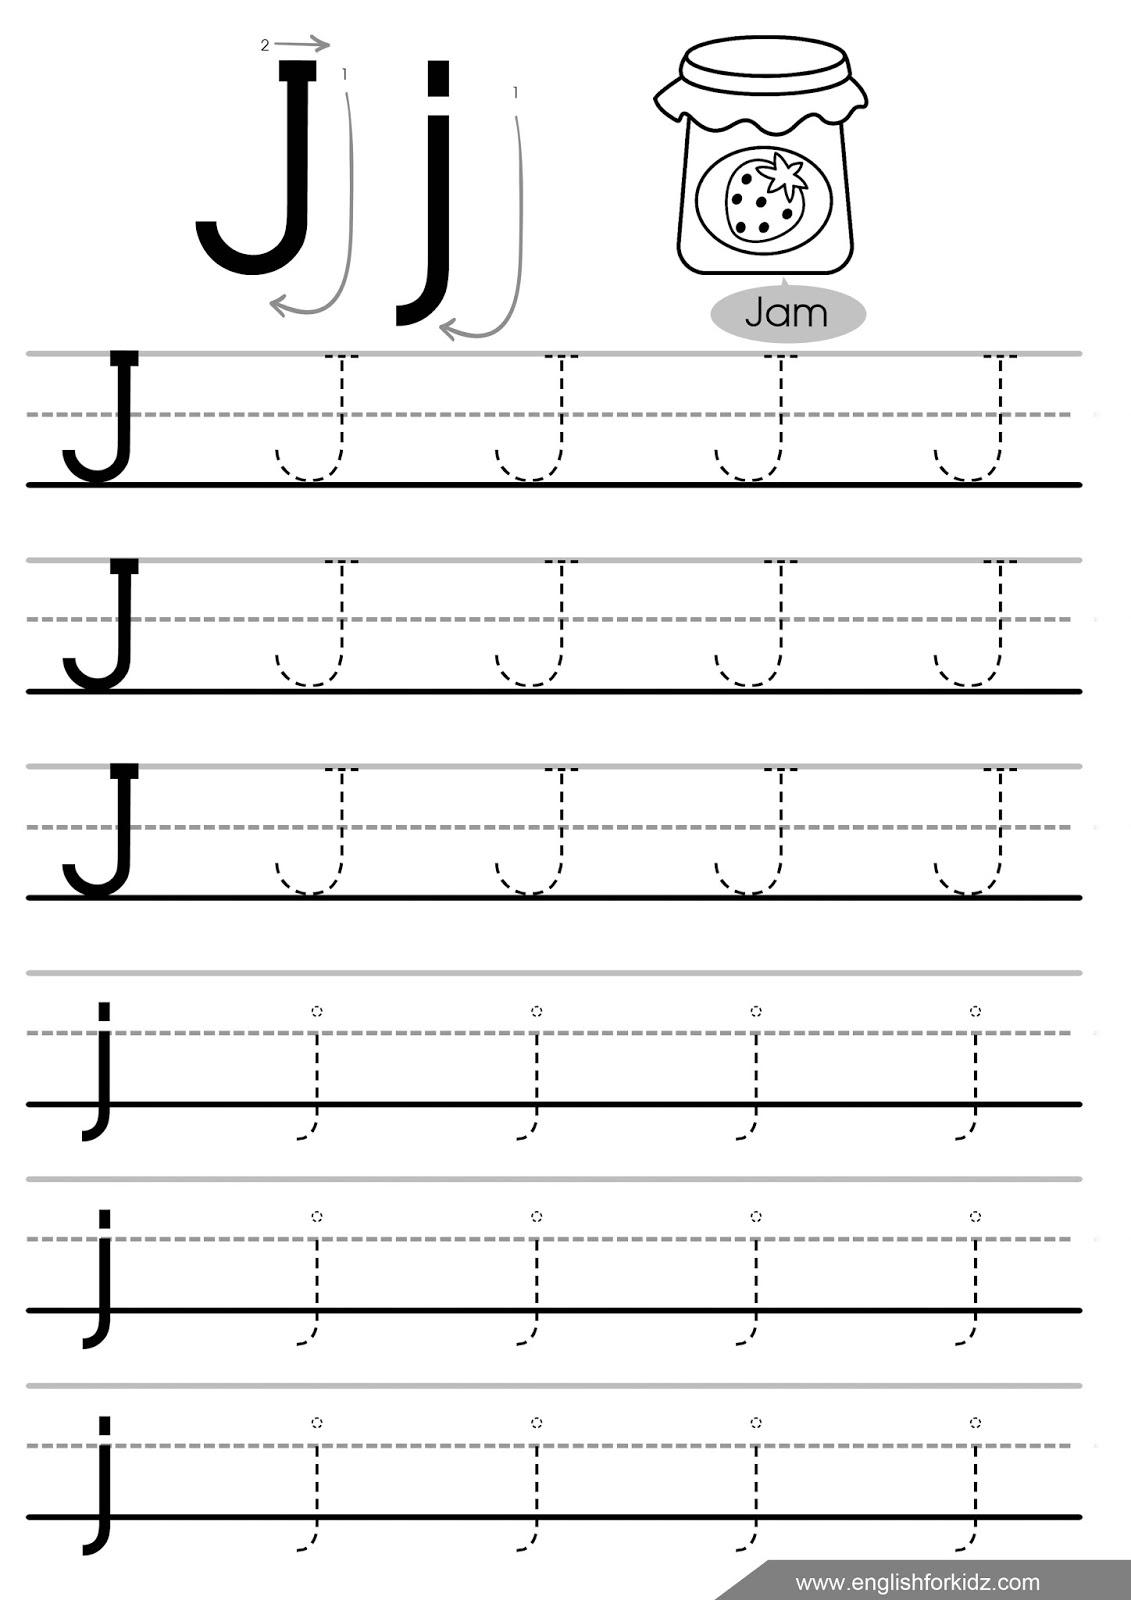 Letter Tracing Worksheets (Letters A - J) for I Letter Tracing Worksheet